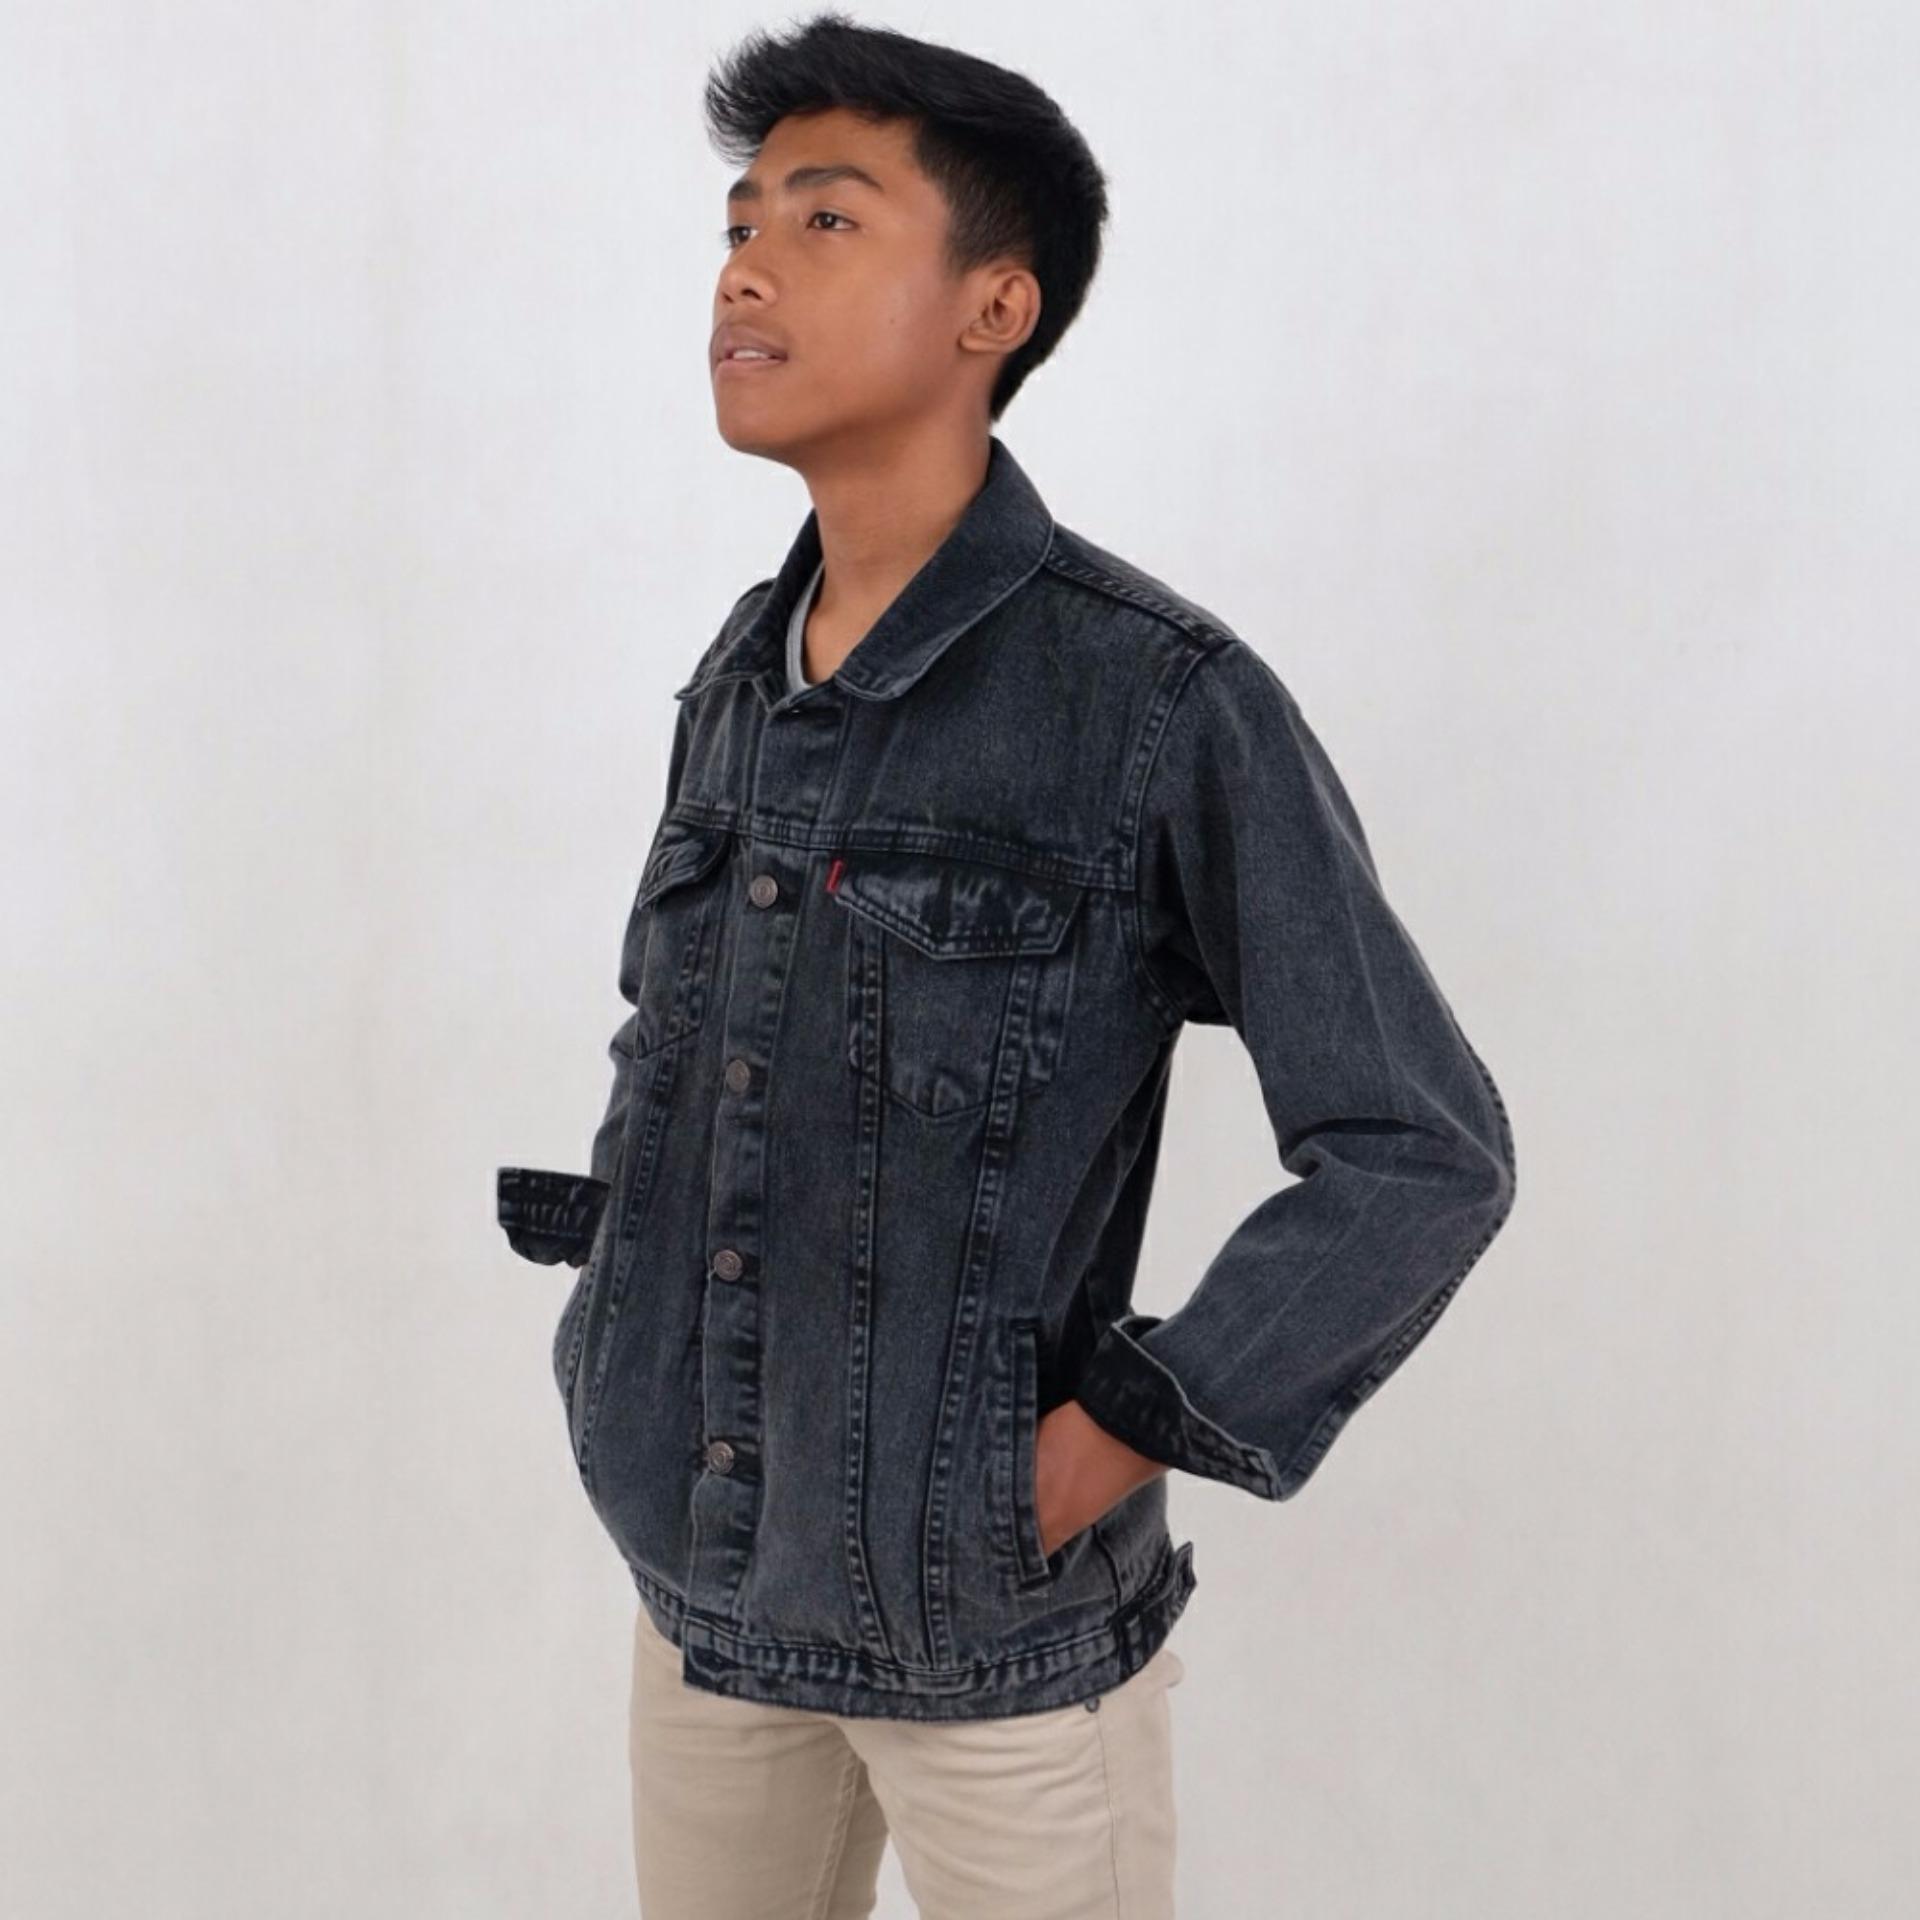 Harga Penawaran Trucker Jaket Jeans Denim Pria Send Wash Abu Best Biru Muda Seller